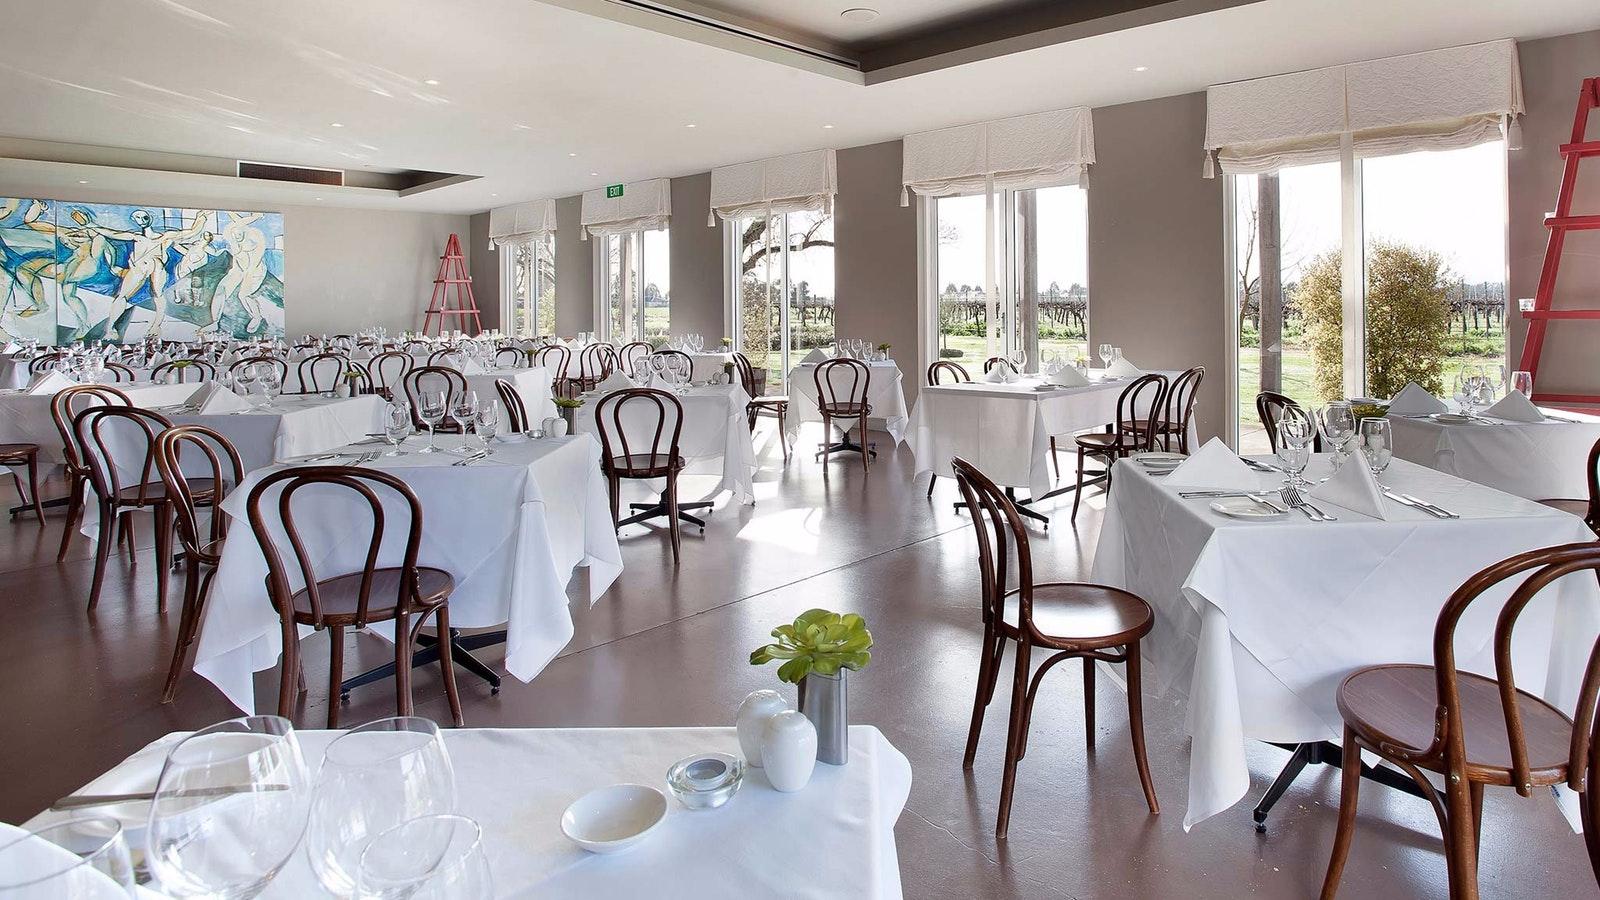 The Restaurant Merlot dining room, at Lindenwarrah